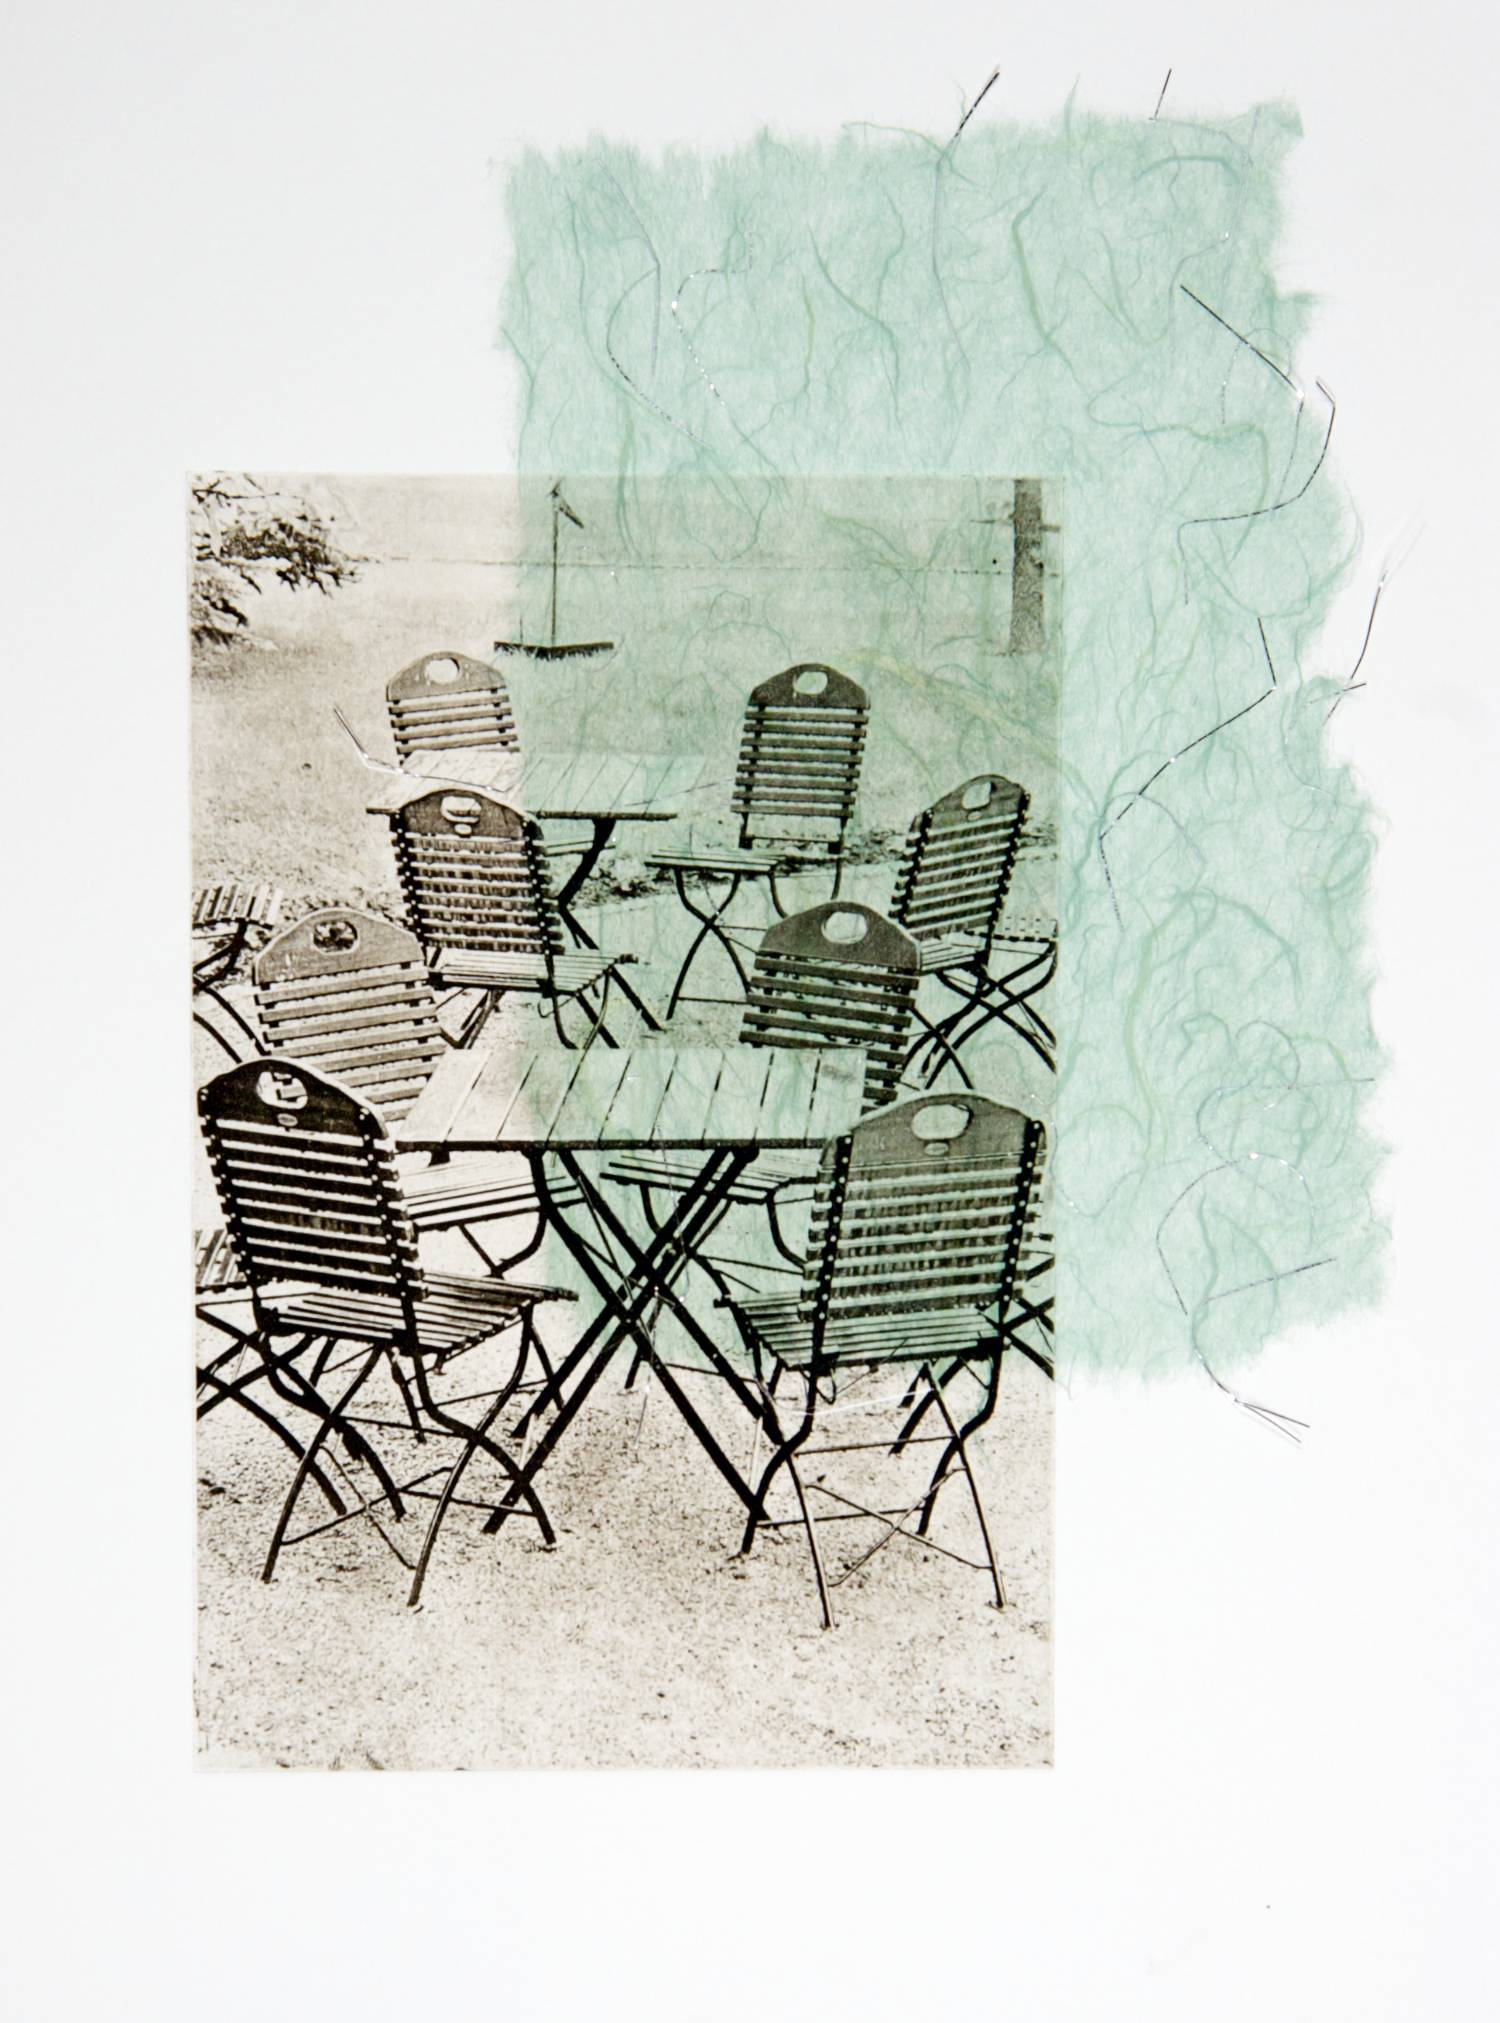 Chairs chine-collé (silver thread)